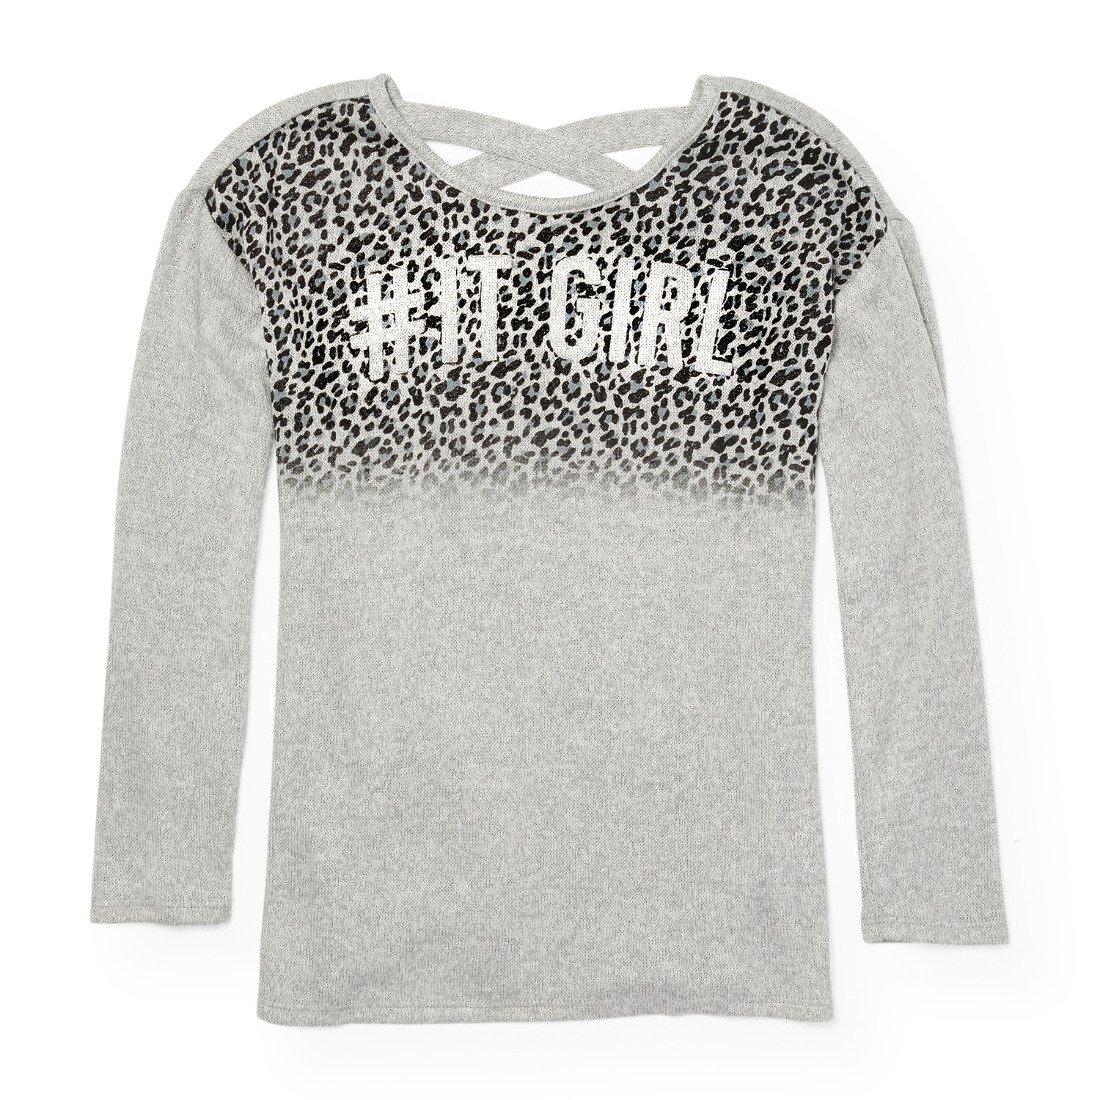 The Children's Place Little Girls' Long Sleeve T-Shirt, Dovetail 88068, S (5/6)